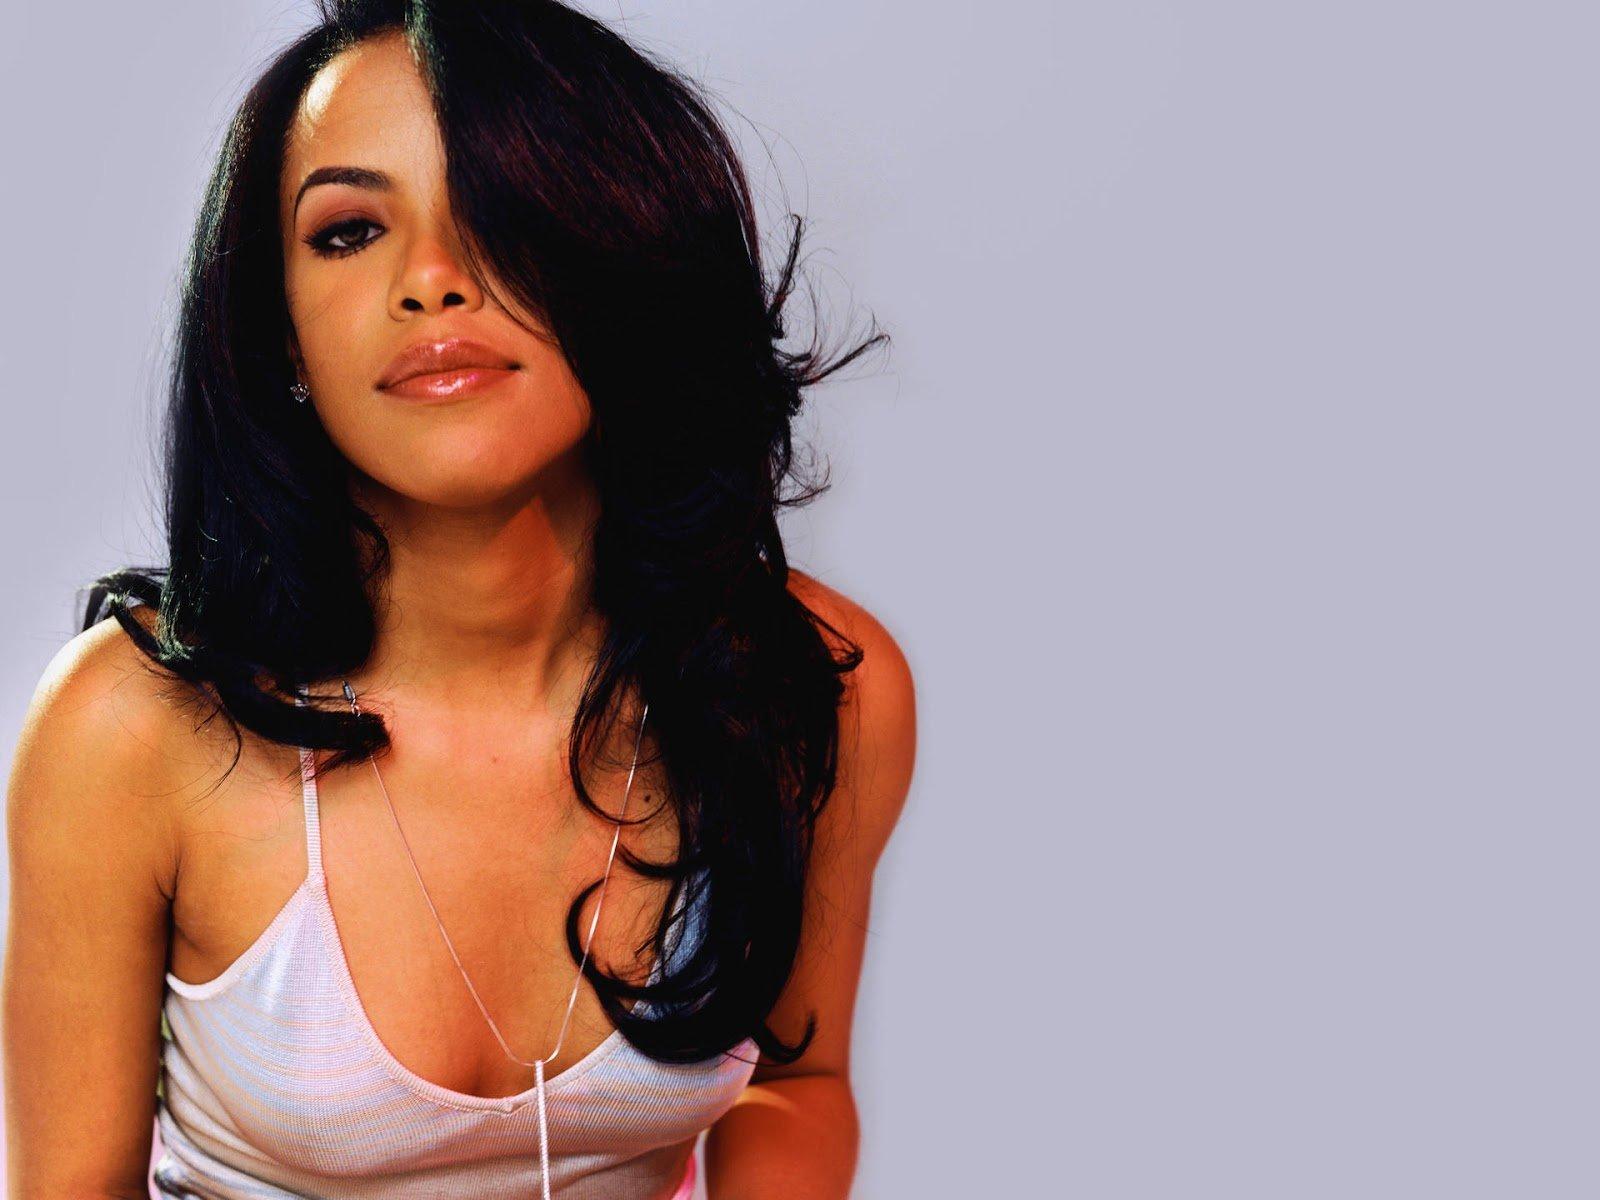 RIP Aaliyah: 15 Years Later, Remembering Aaliyah's Legacy